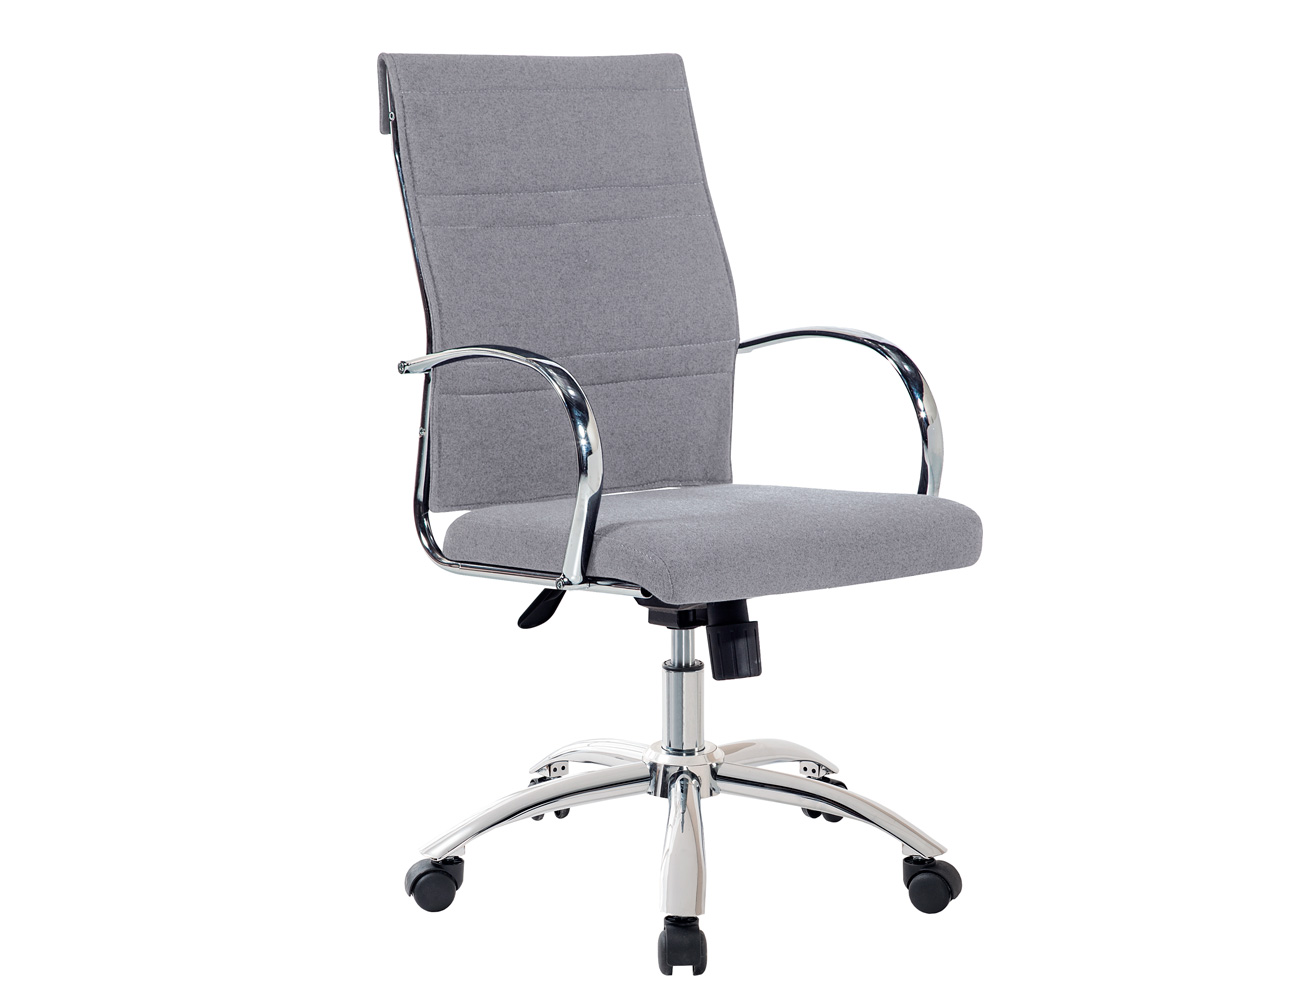 Silla oficina o despacho con apoya brazos con ruedas y regulable en ...